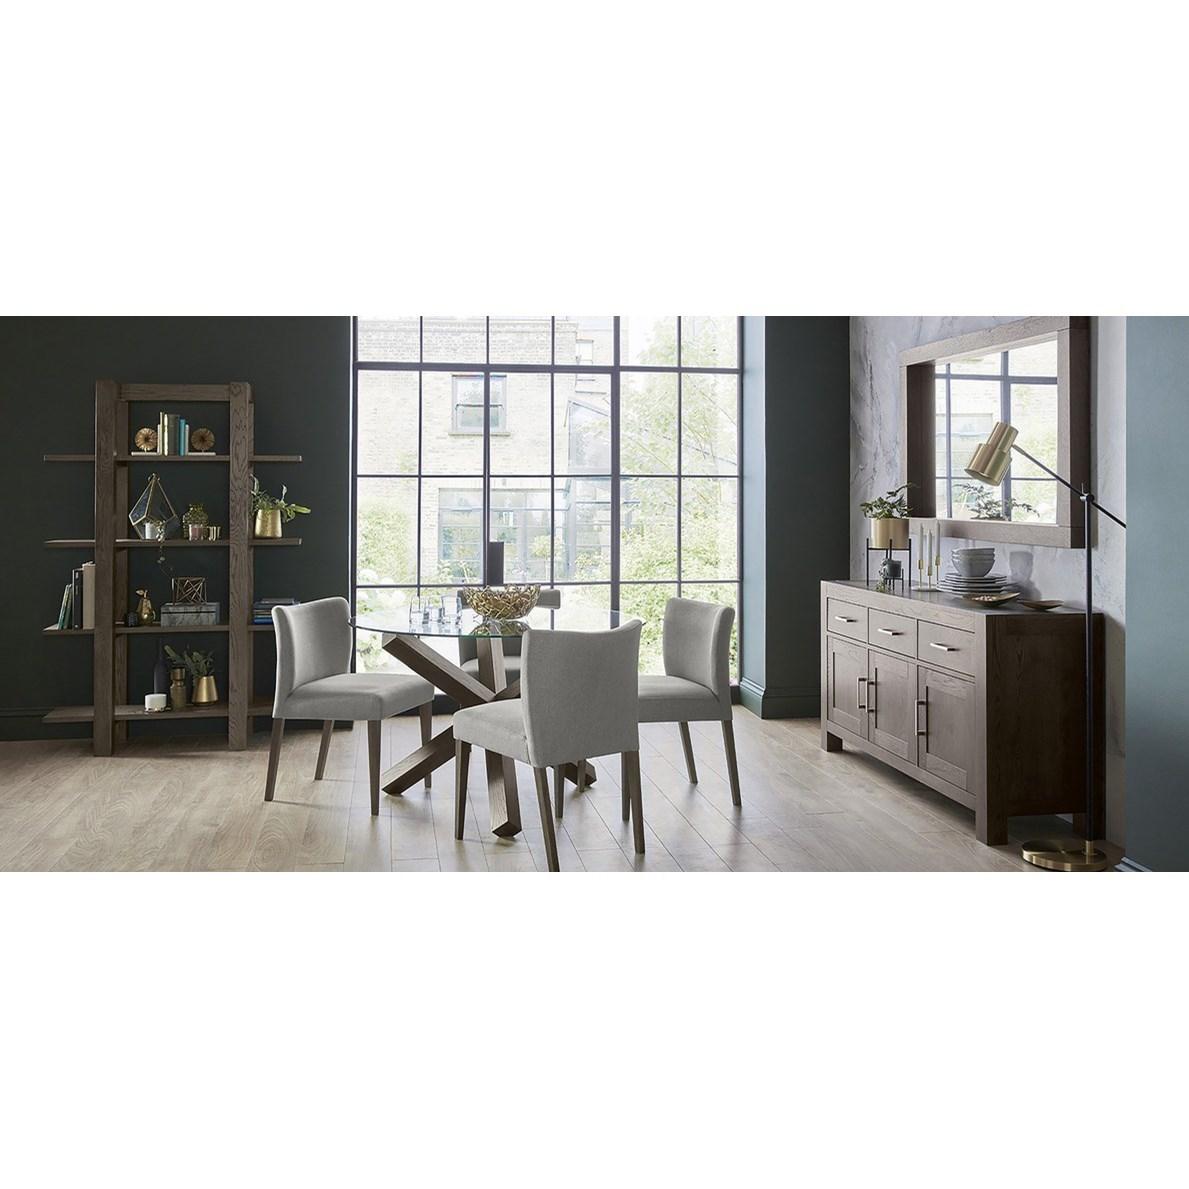 Gardiner-Saylor Dining Room Group by Palliser at Jordan's Home Furnishings